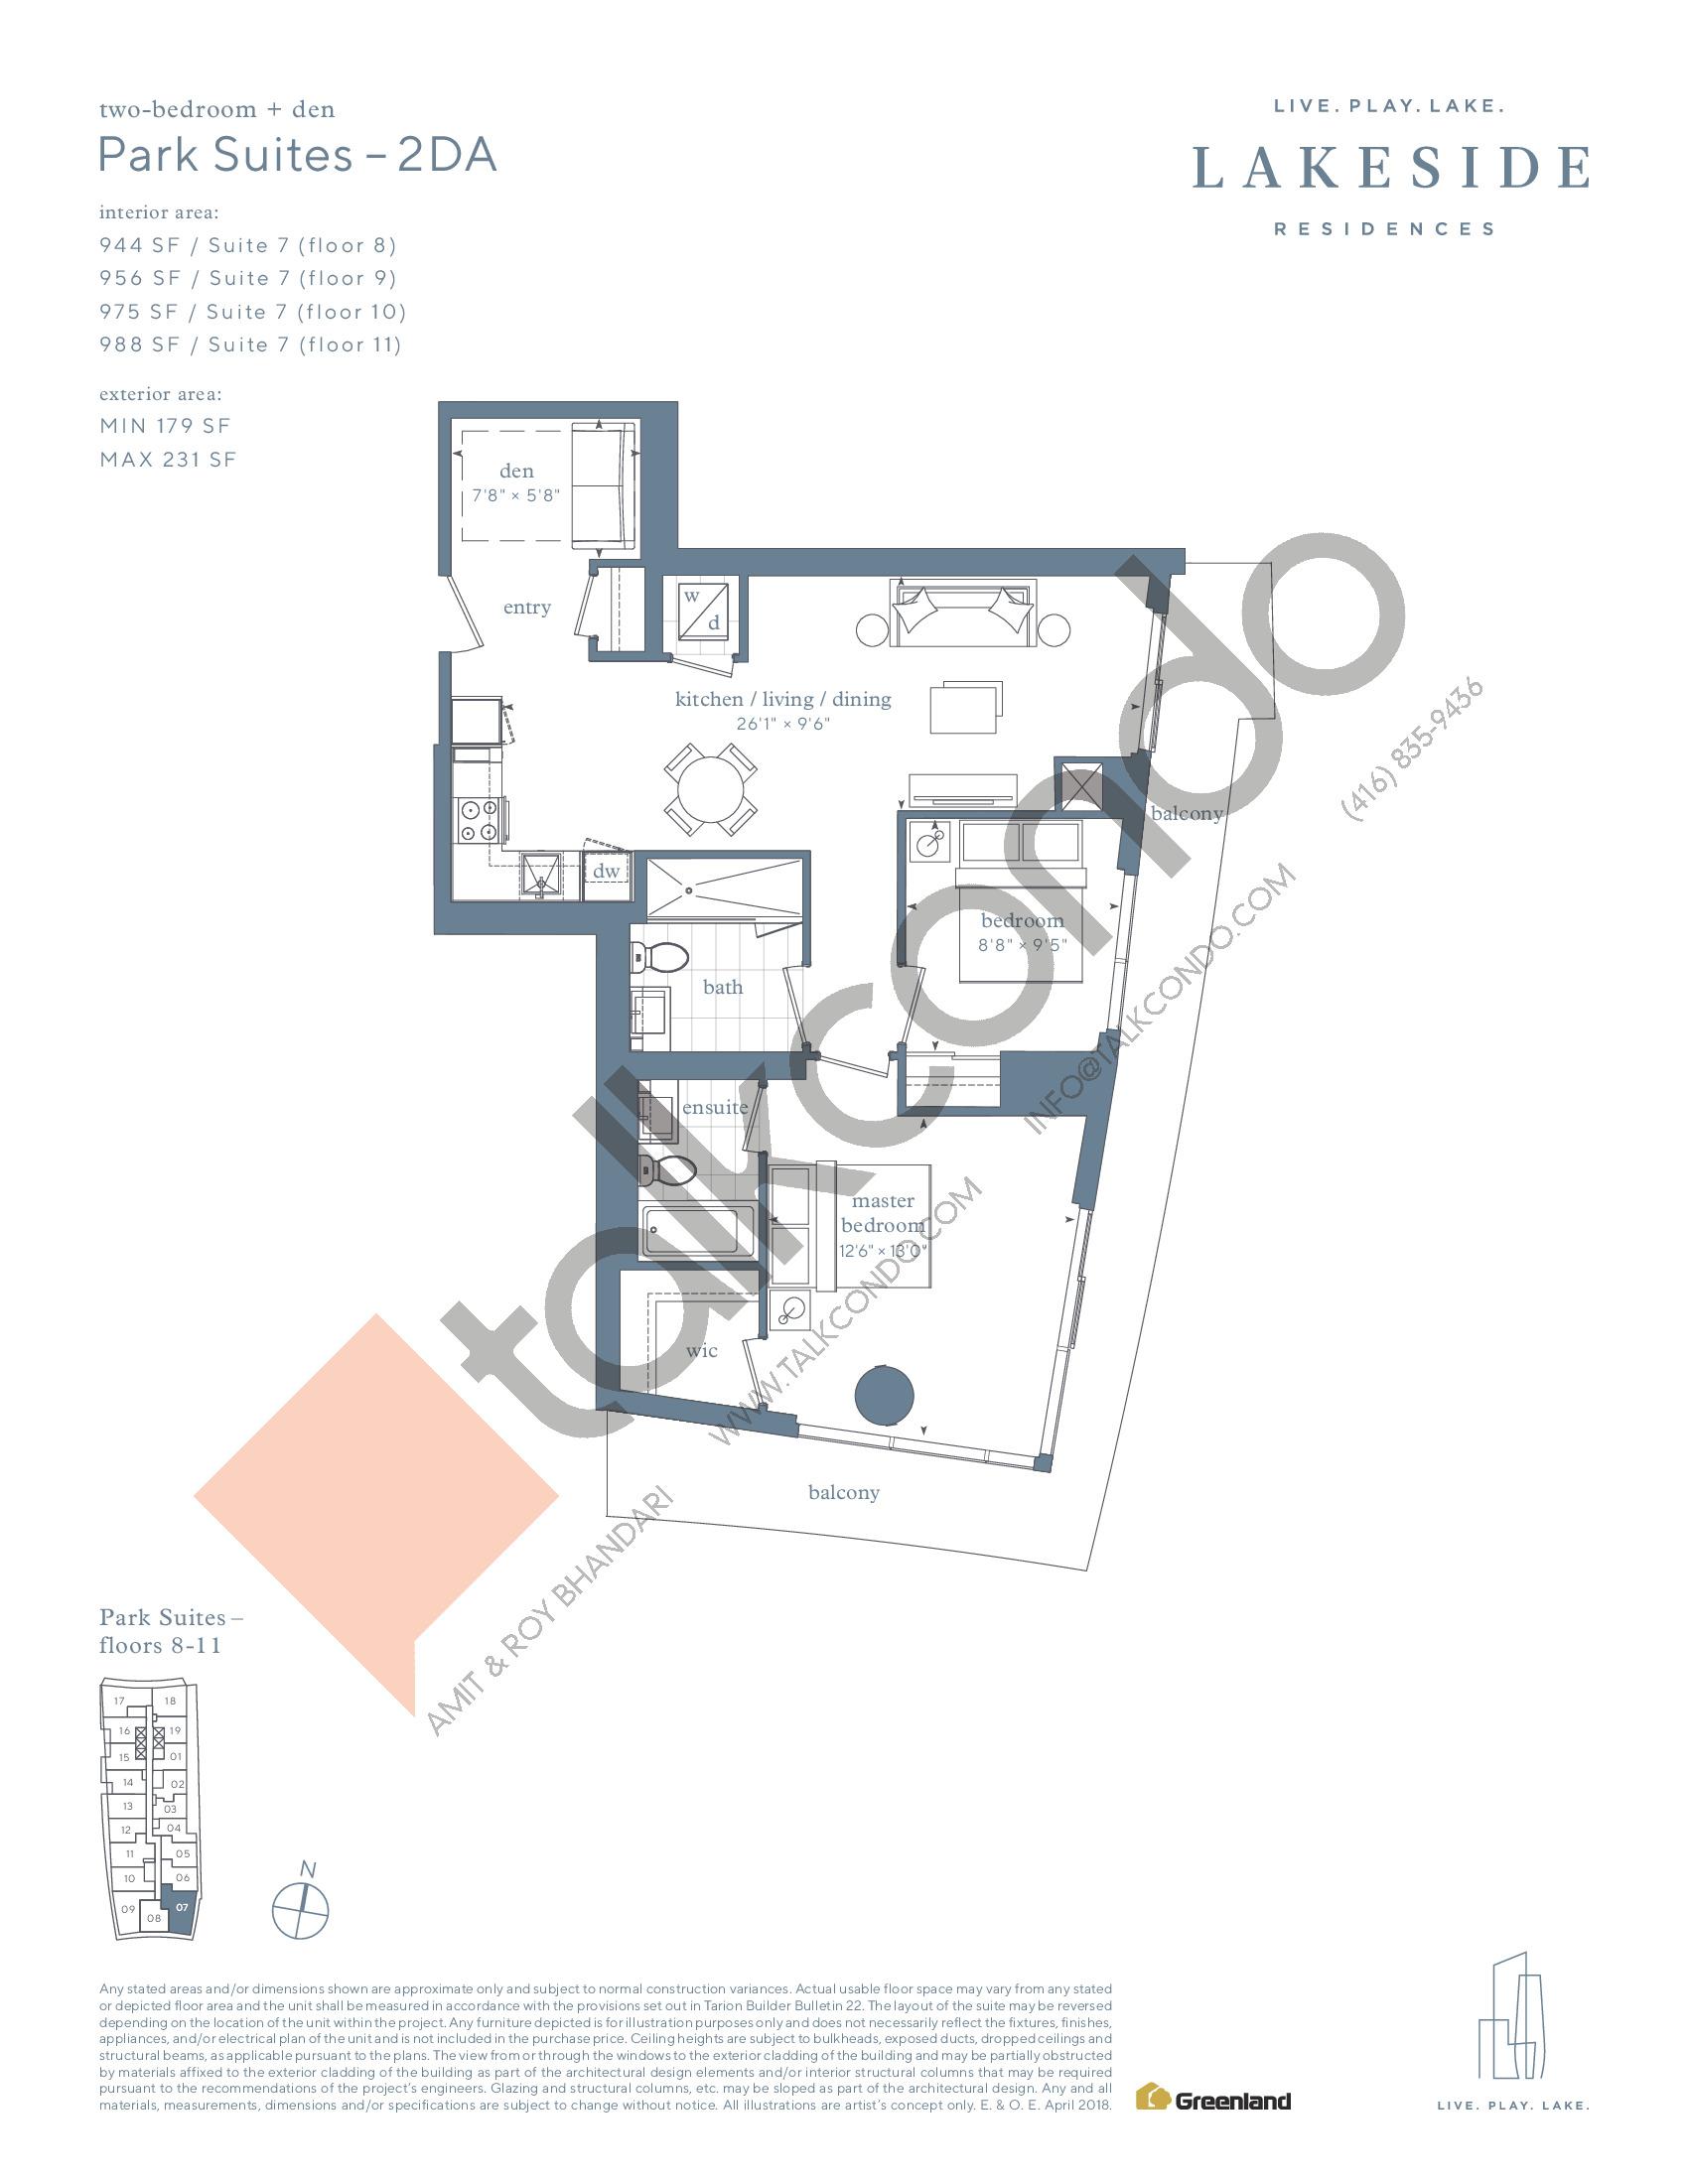 Park Suites - 2DA Floor Plan at Lakeside Residences - 988 sq.ft